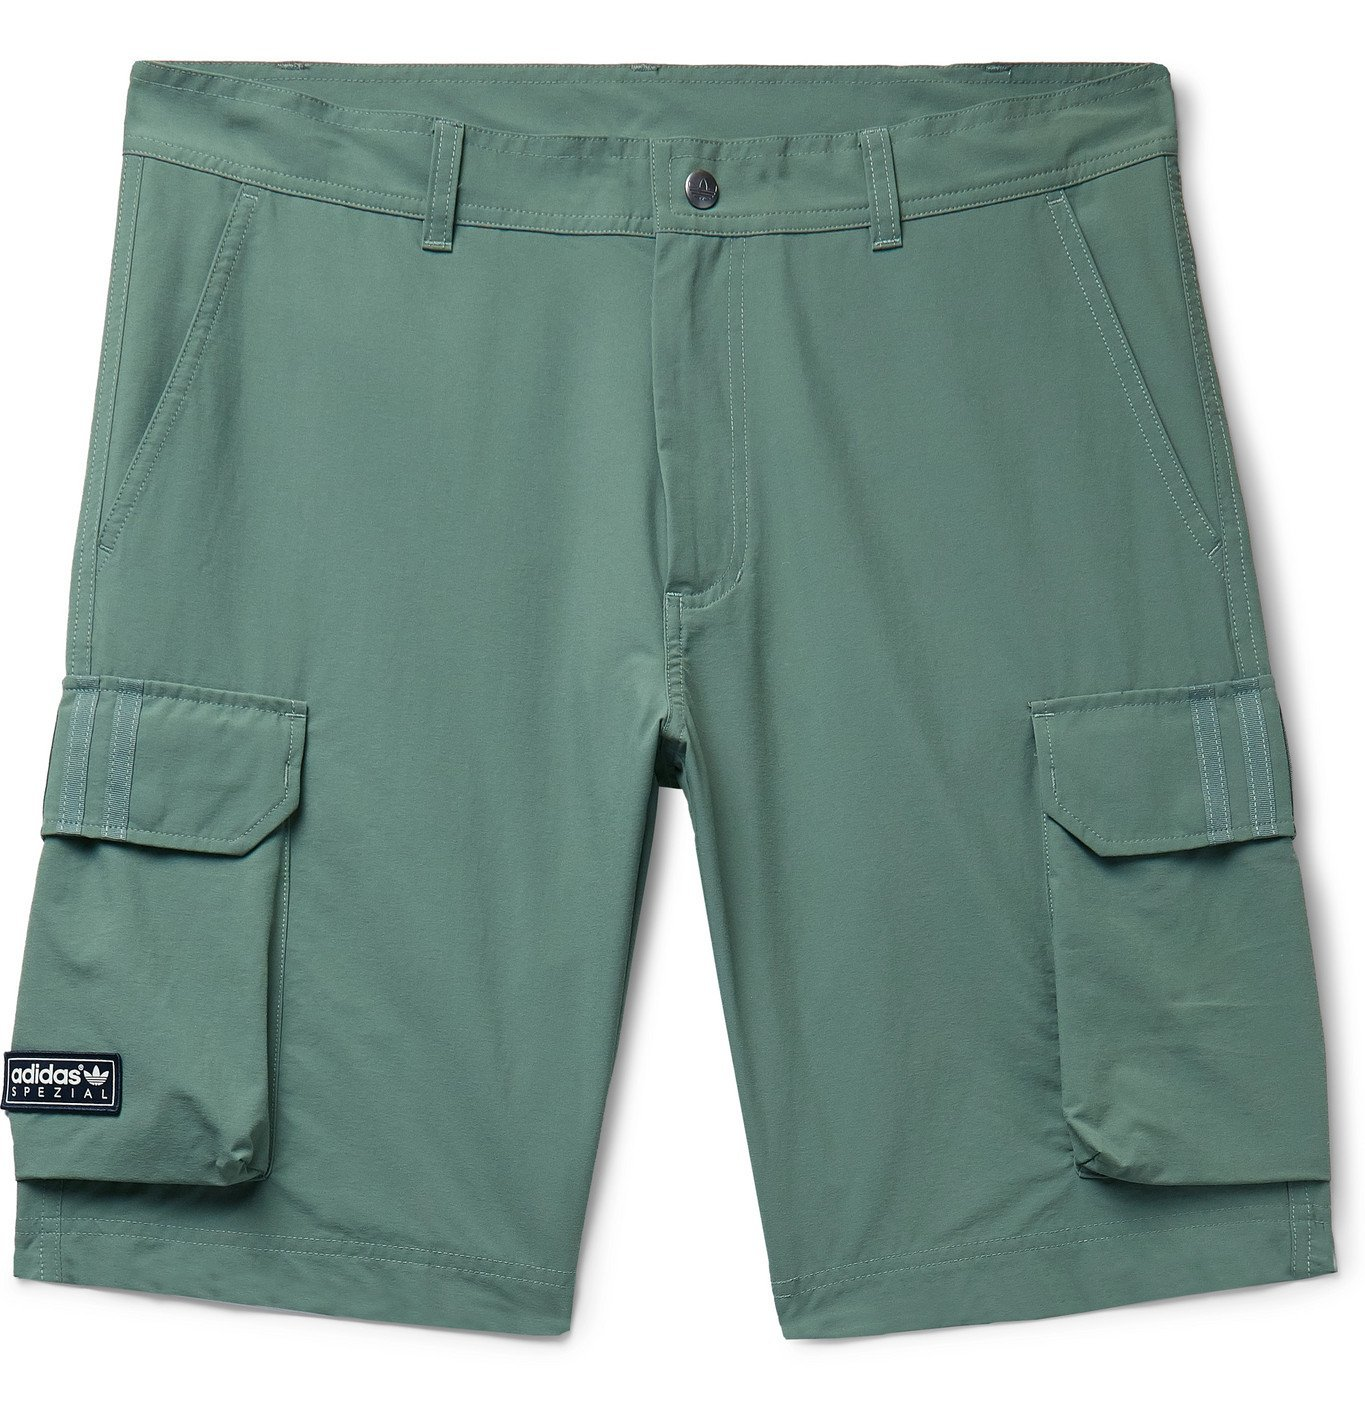 SPEZIAL Standish Shell Cargo Shorts